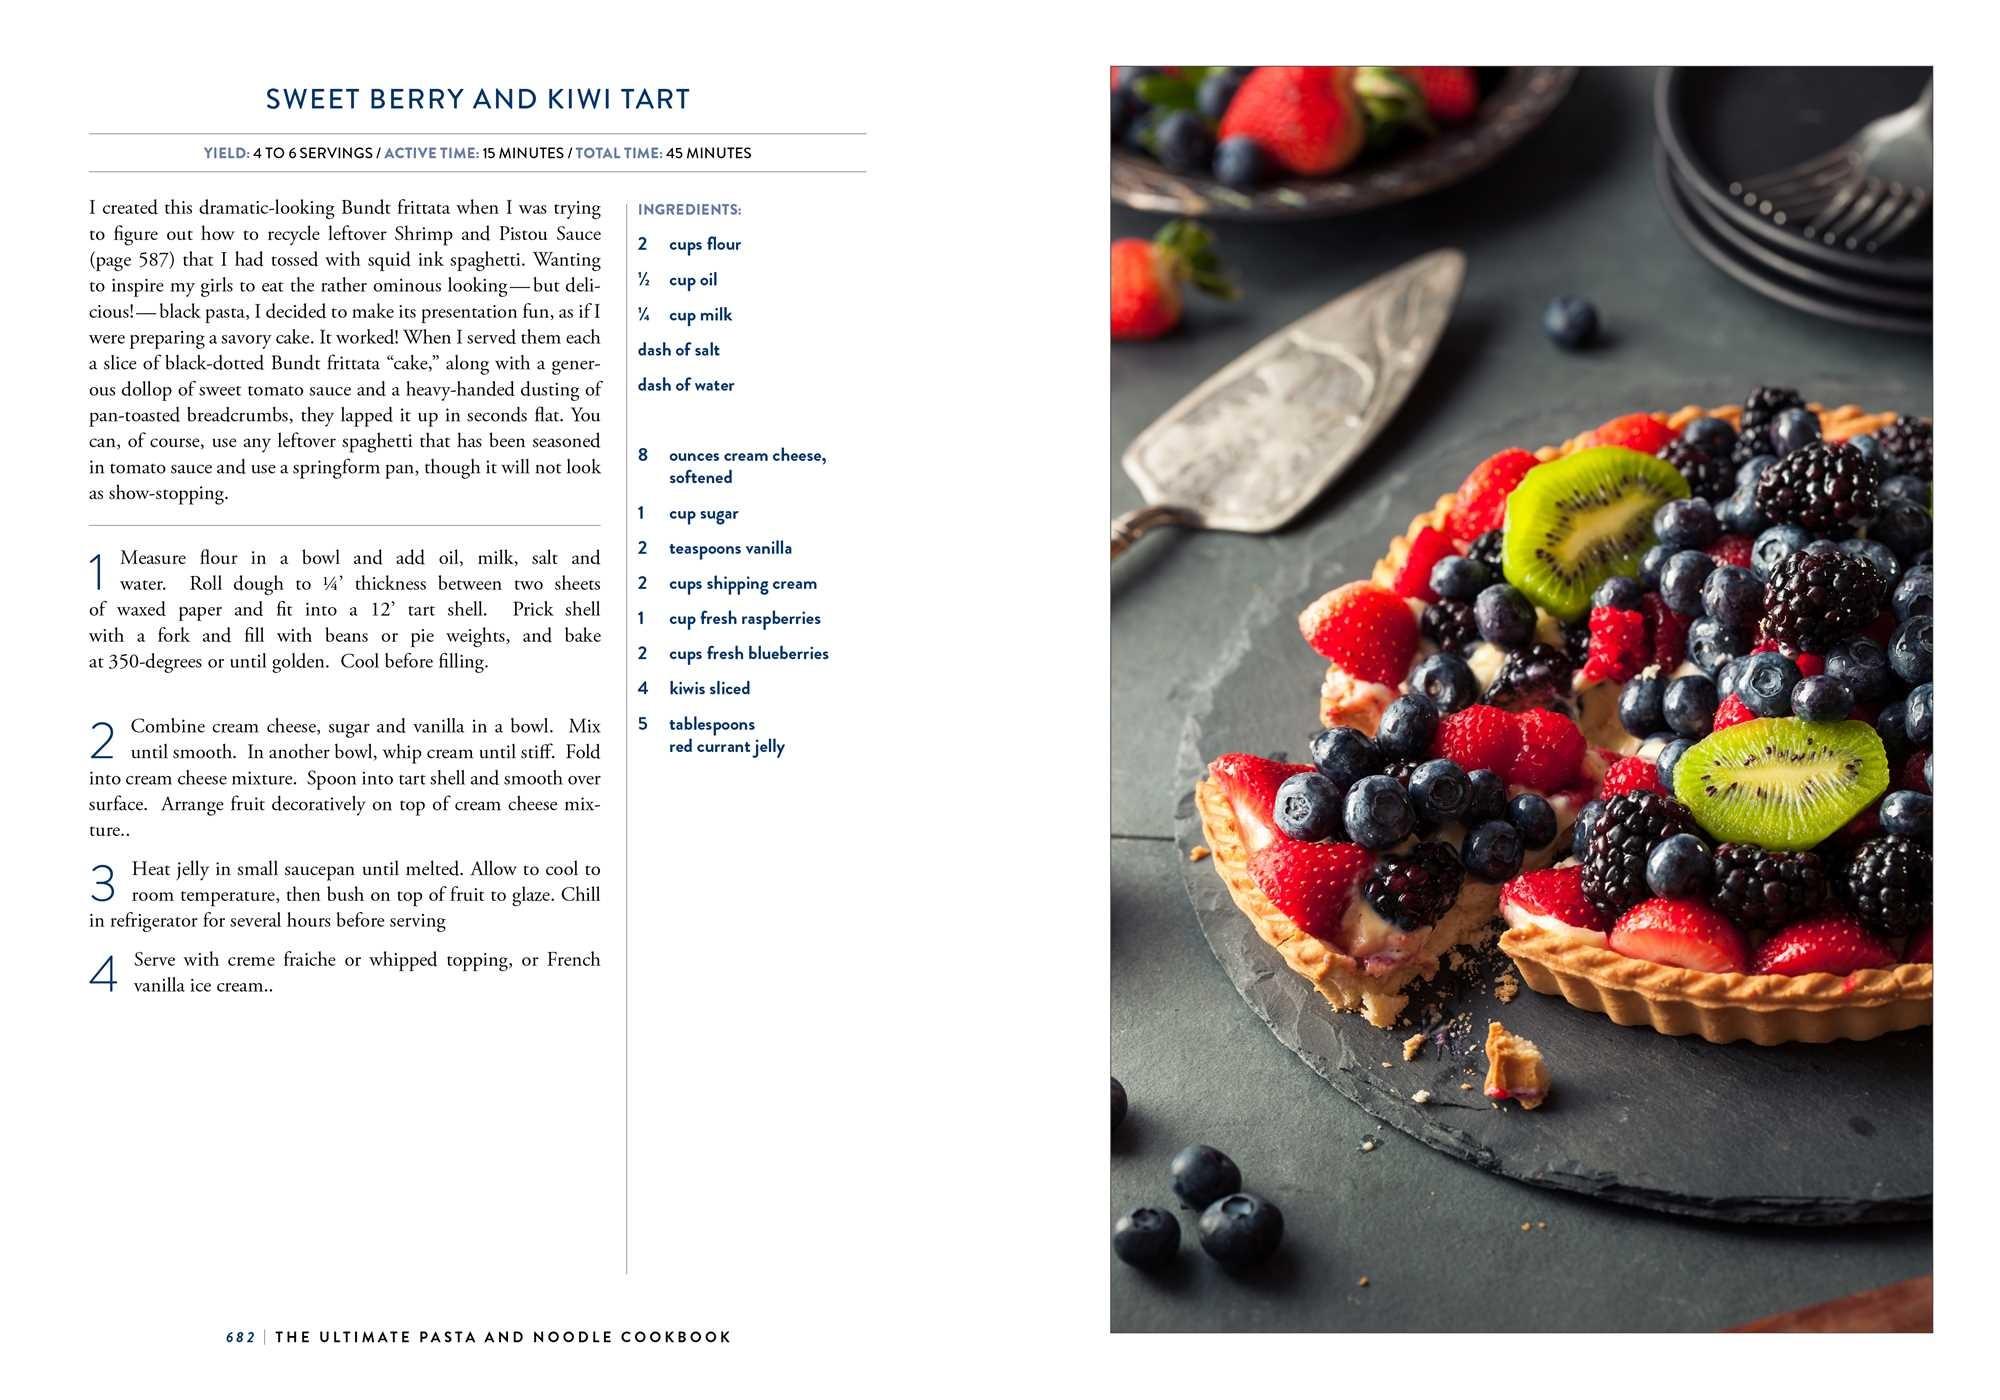 The big book of crusts 9781604337365.in06